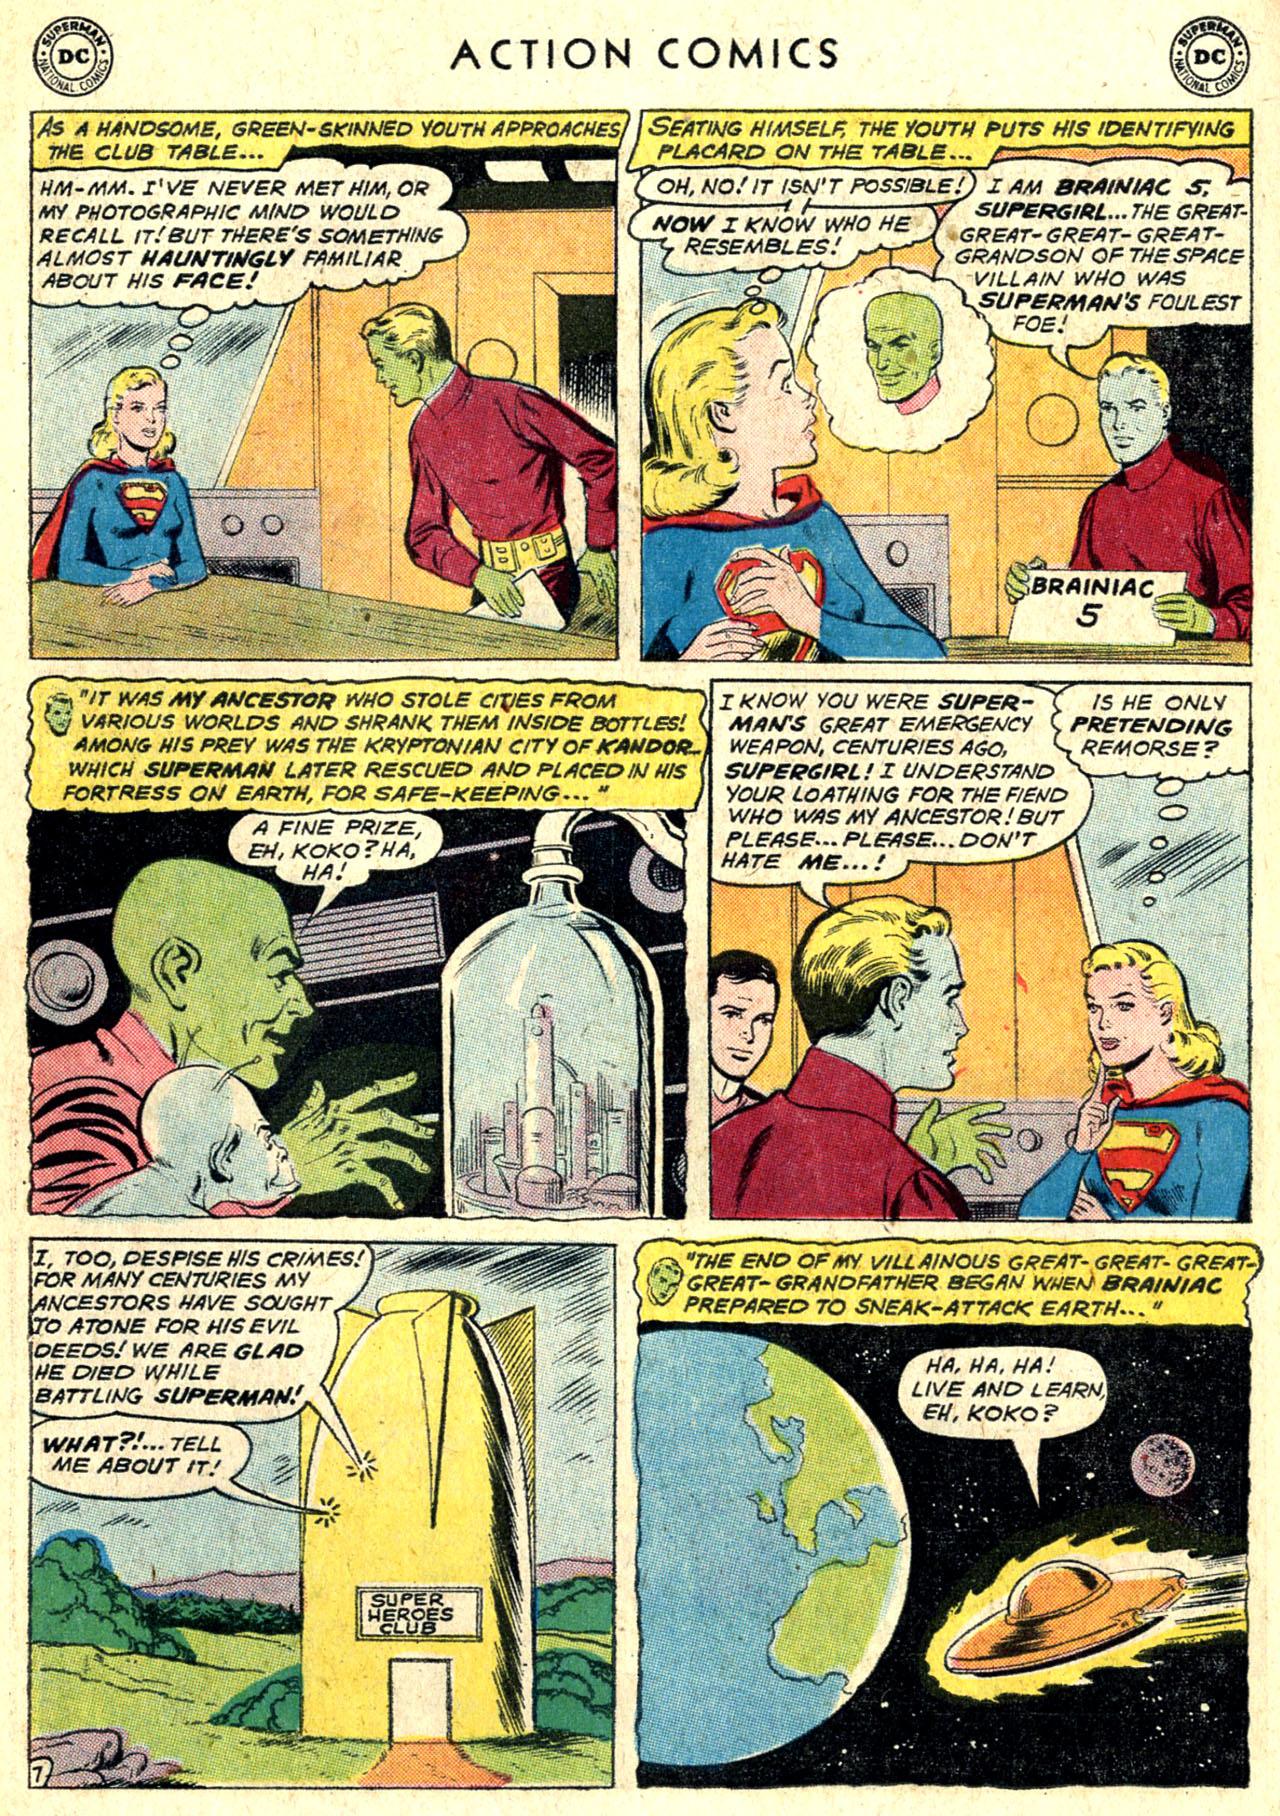 Action Comics (1938) 276 Page 25